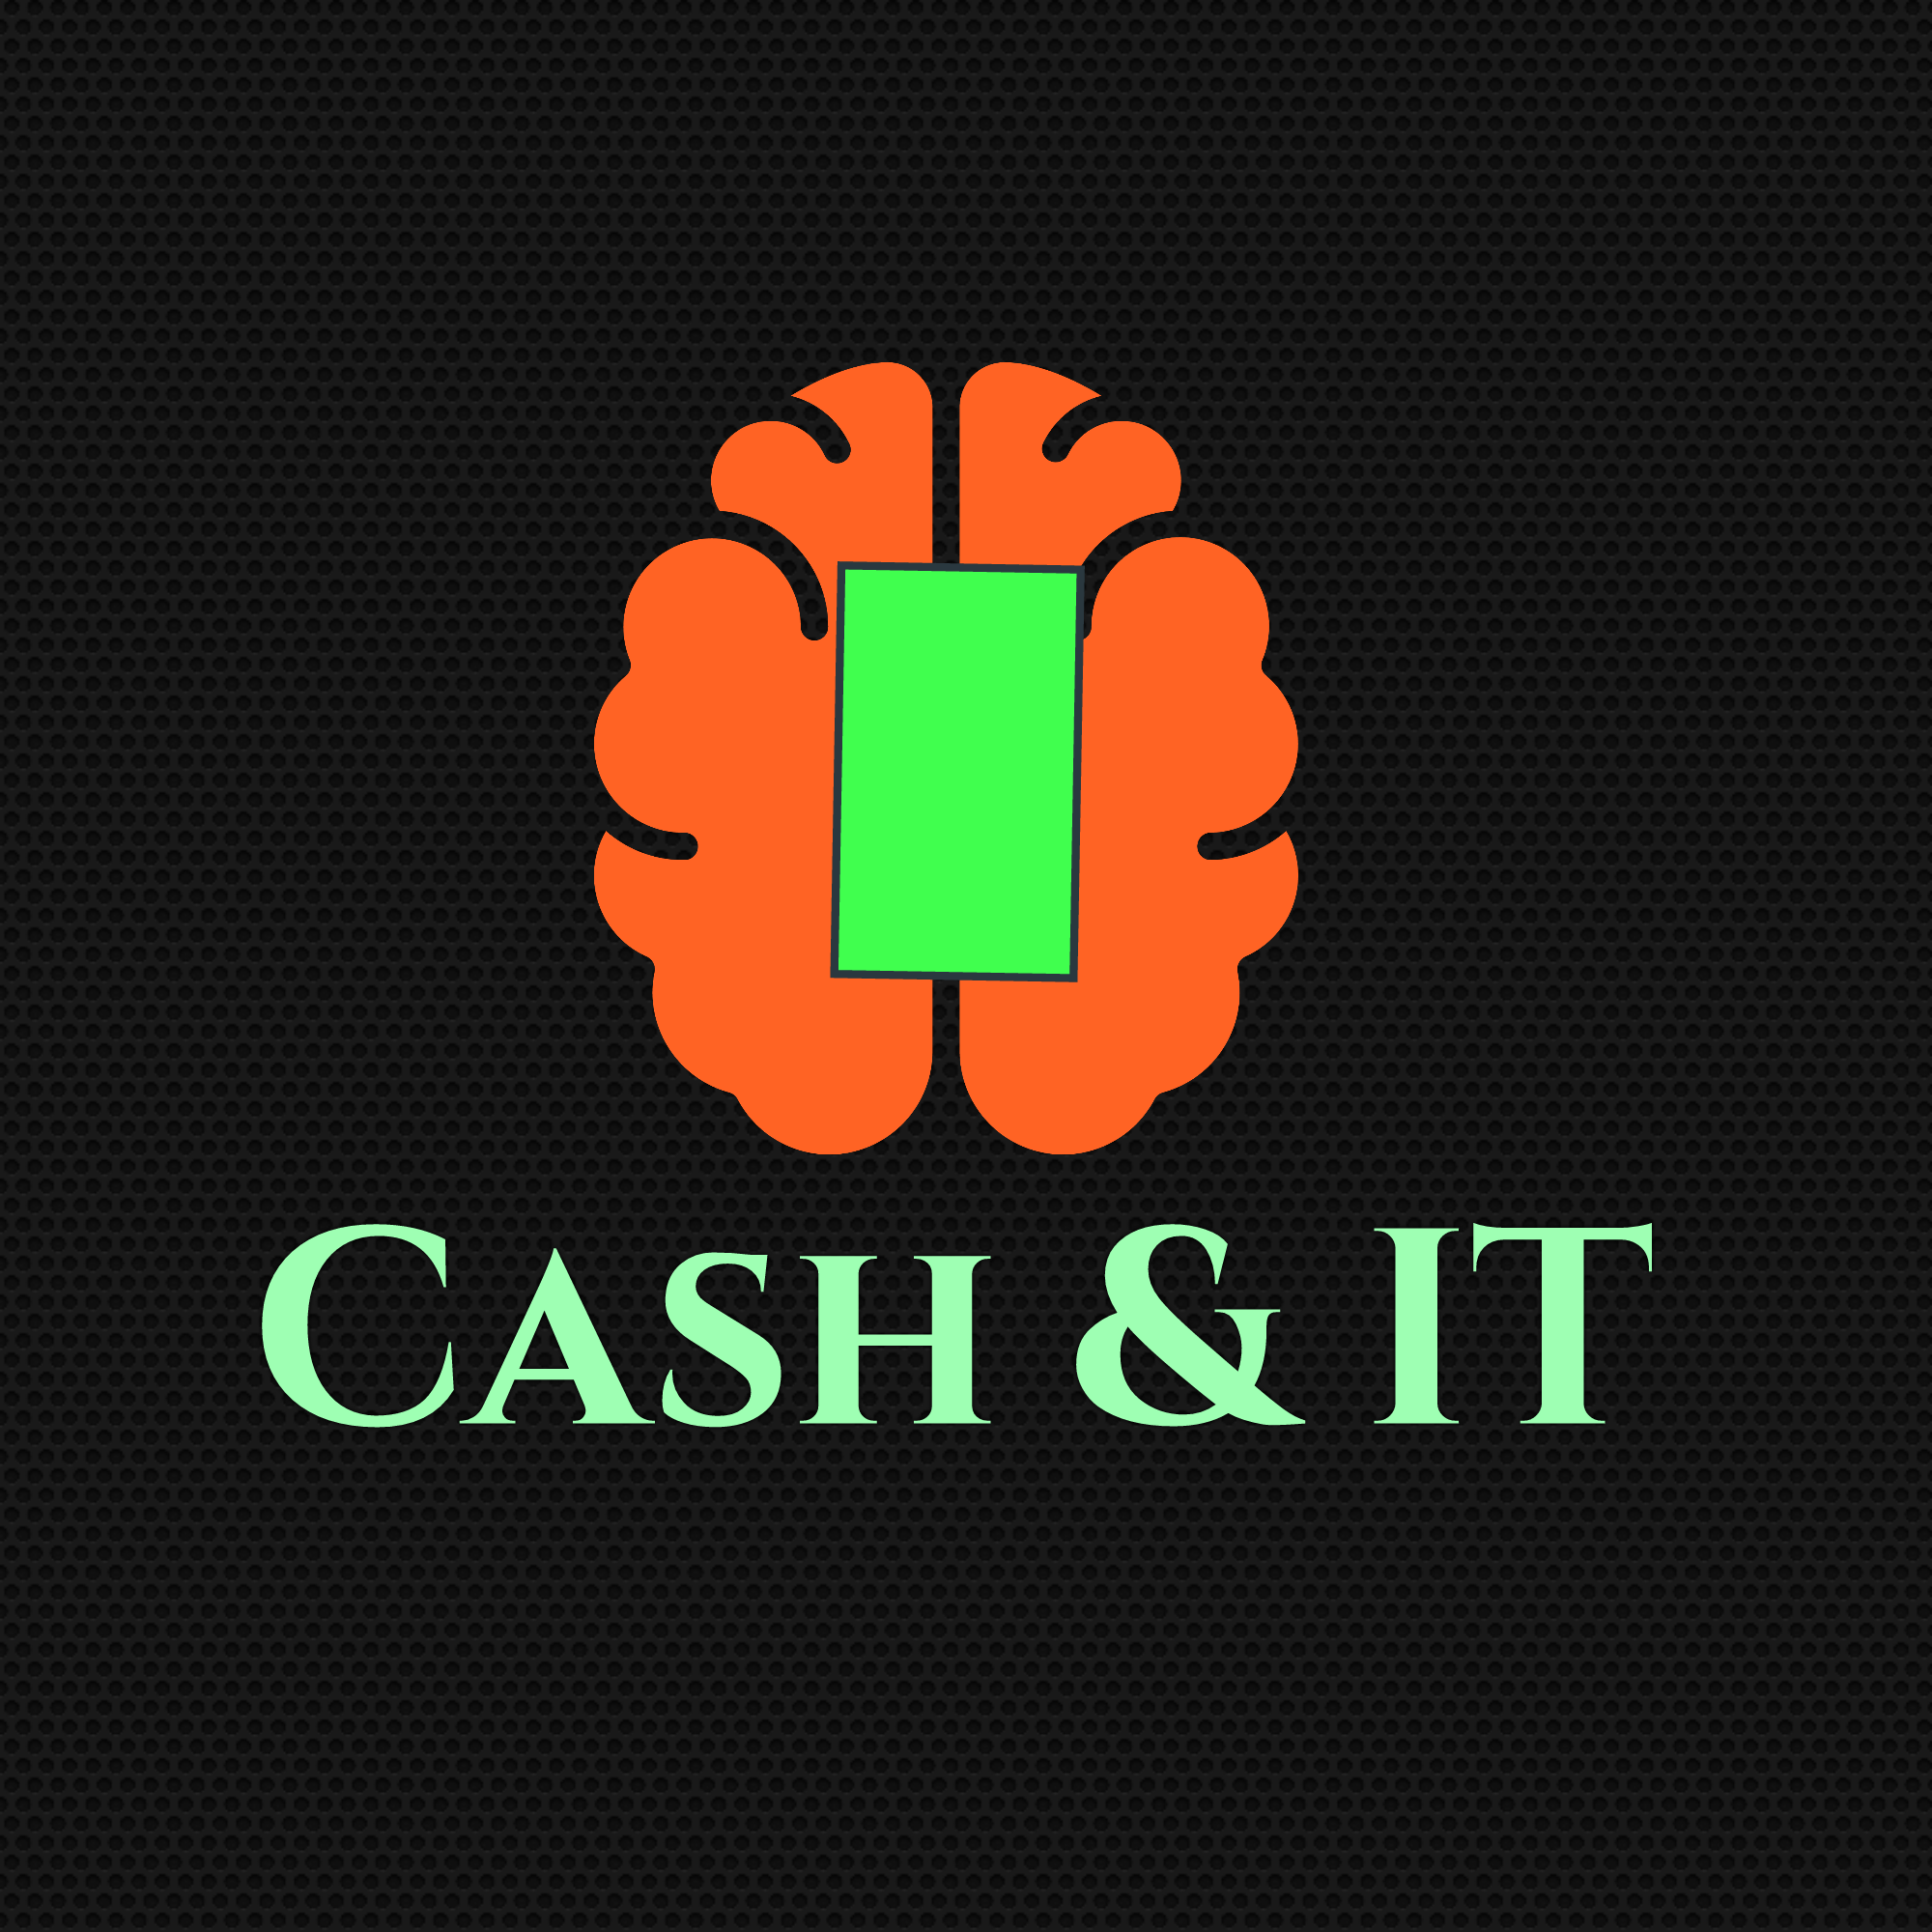 Логотип для Cash & IT - сервис доставки денег фото f_1185fdb6d1bbfb14.png